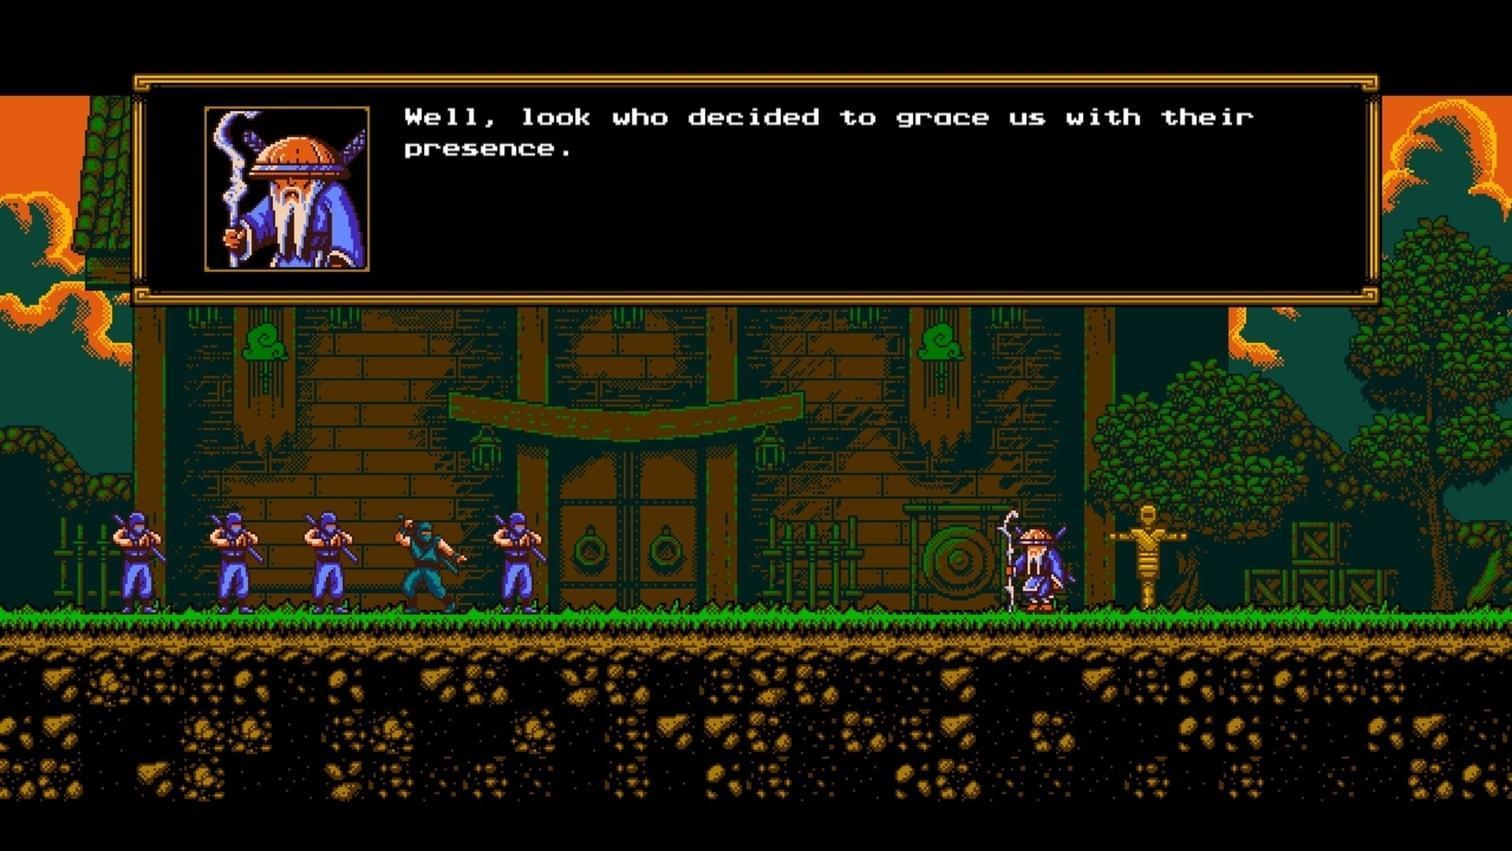 <p>Genre: Abenteuer<br />Entwickler: DONTNOD Entertainment<br />Publisher: Square Enix<br />Veröffentlichung: 26. Sep. 2018</p> Foto: Screenshot